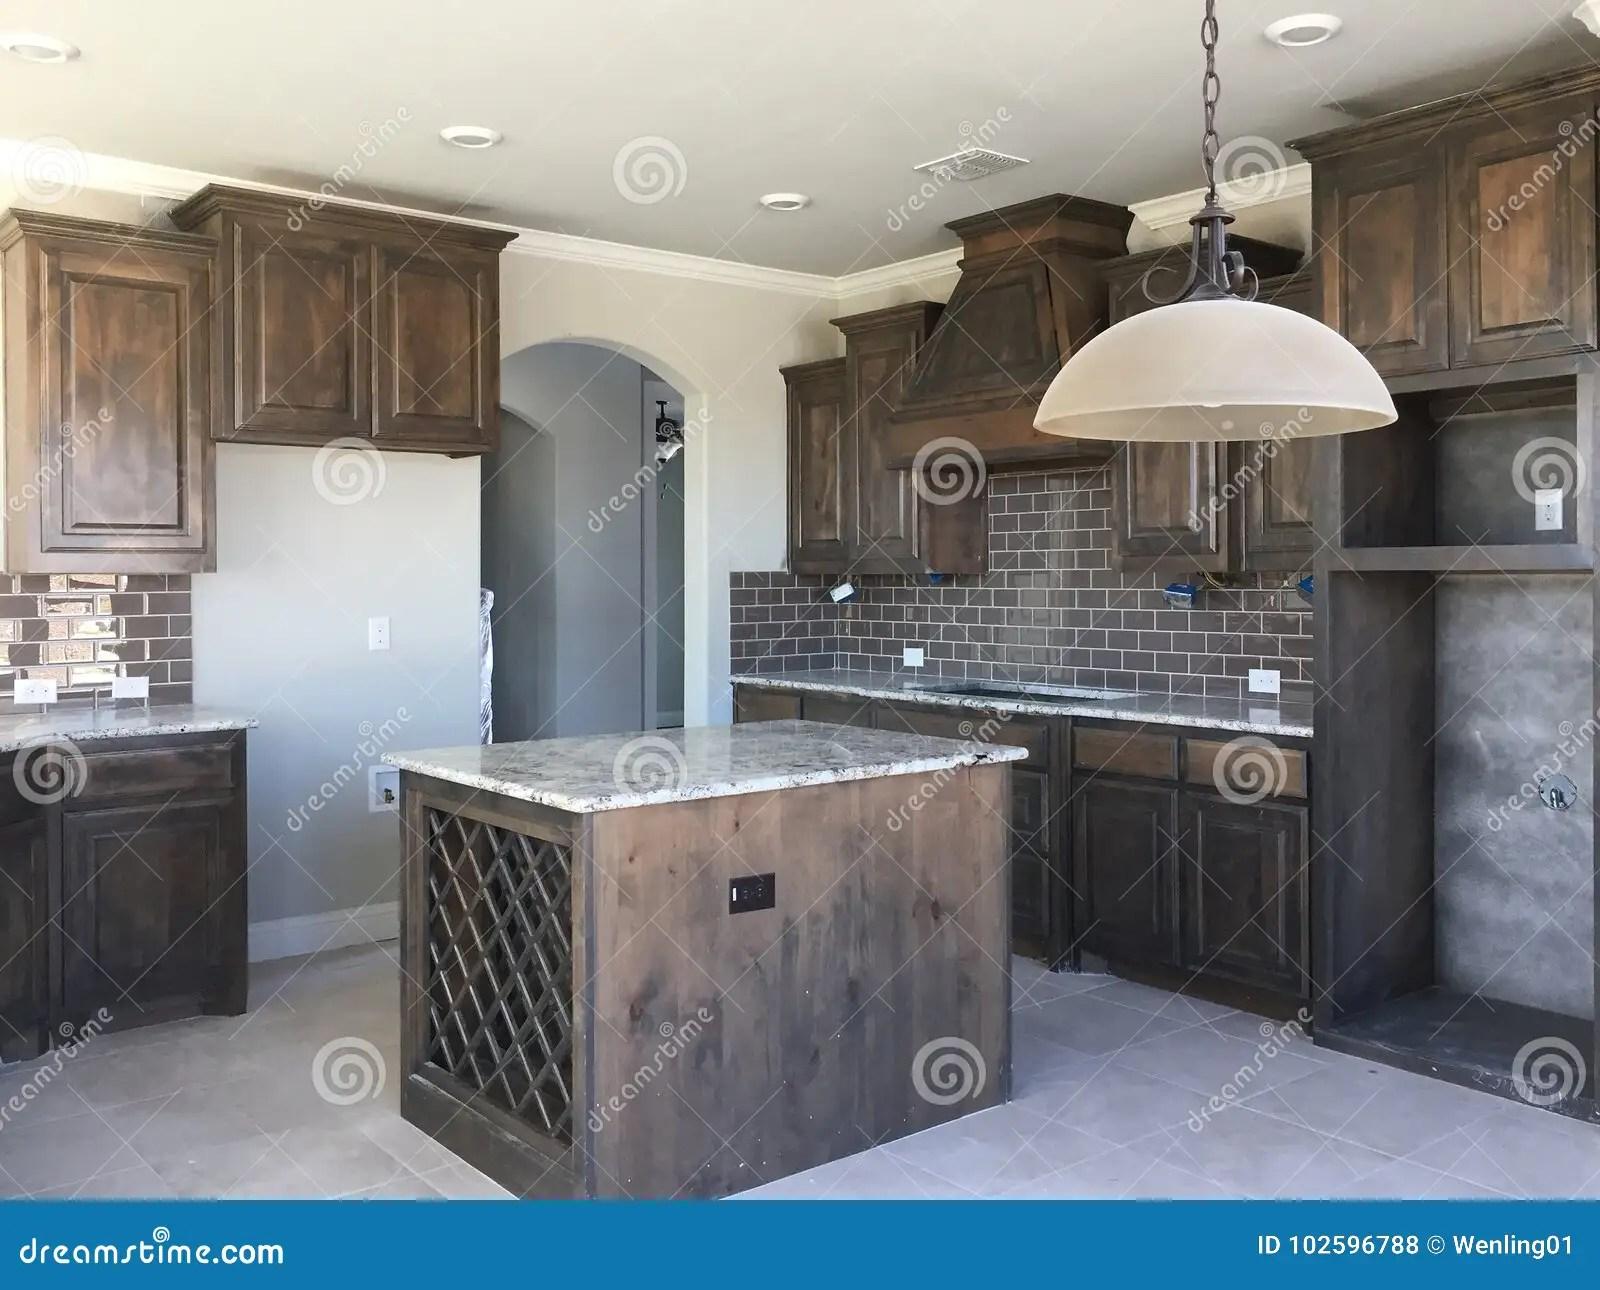 in stock kitchens refurbished kitchen table 有海岛柜台的厨房建设中库存照片 图片包括有灌肠器 邻居 社区 家庭 有海岛柜台的厨房建设中